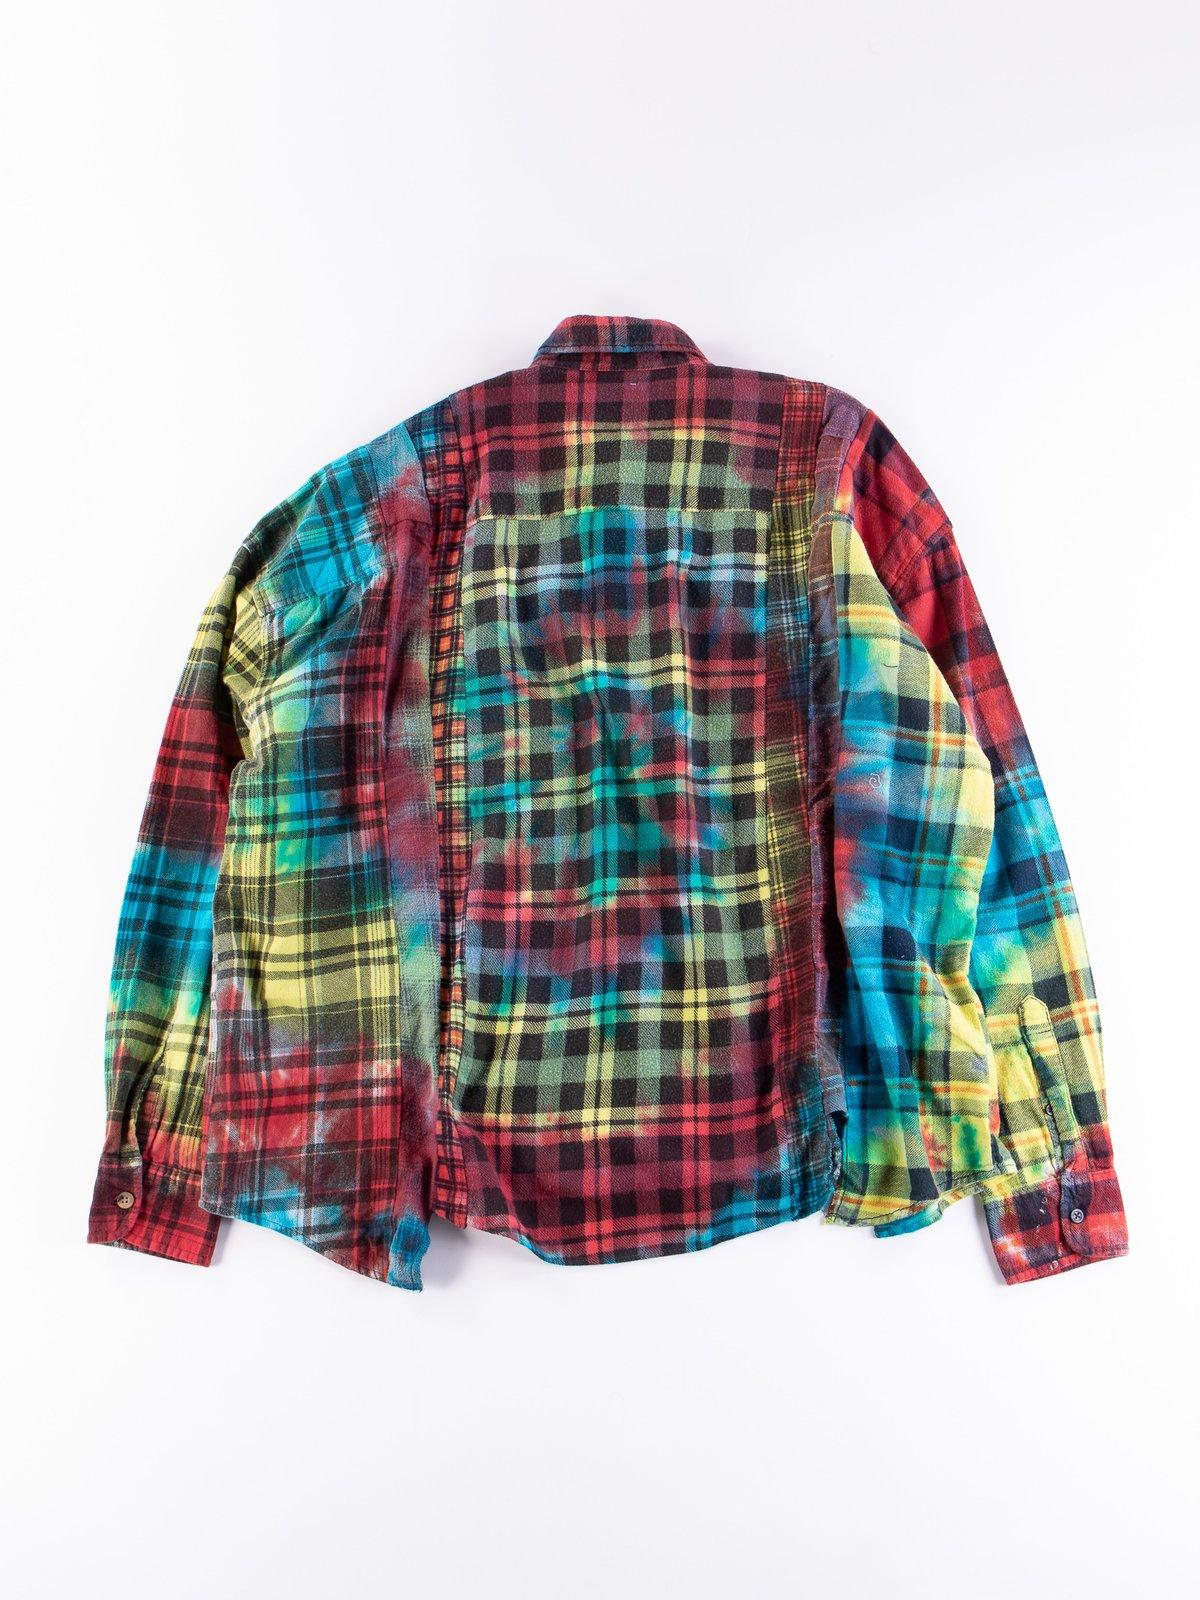 Tie Dye Assorted 7 Cuts Rebuild Shirt - Image 2